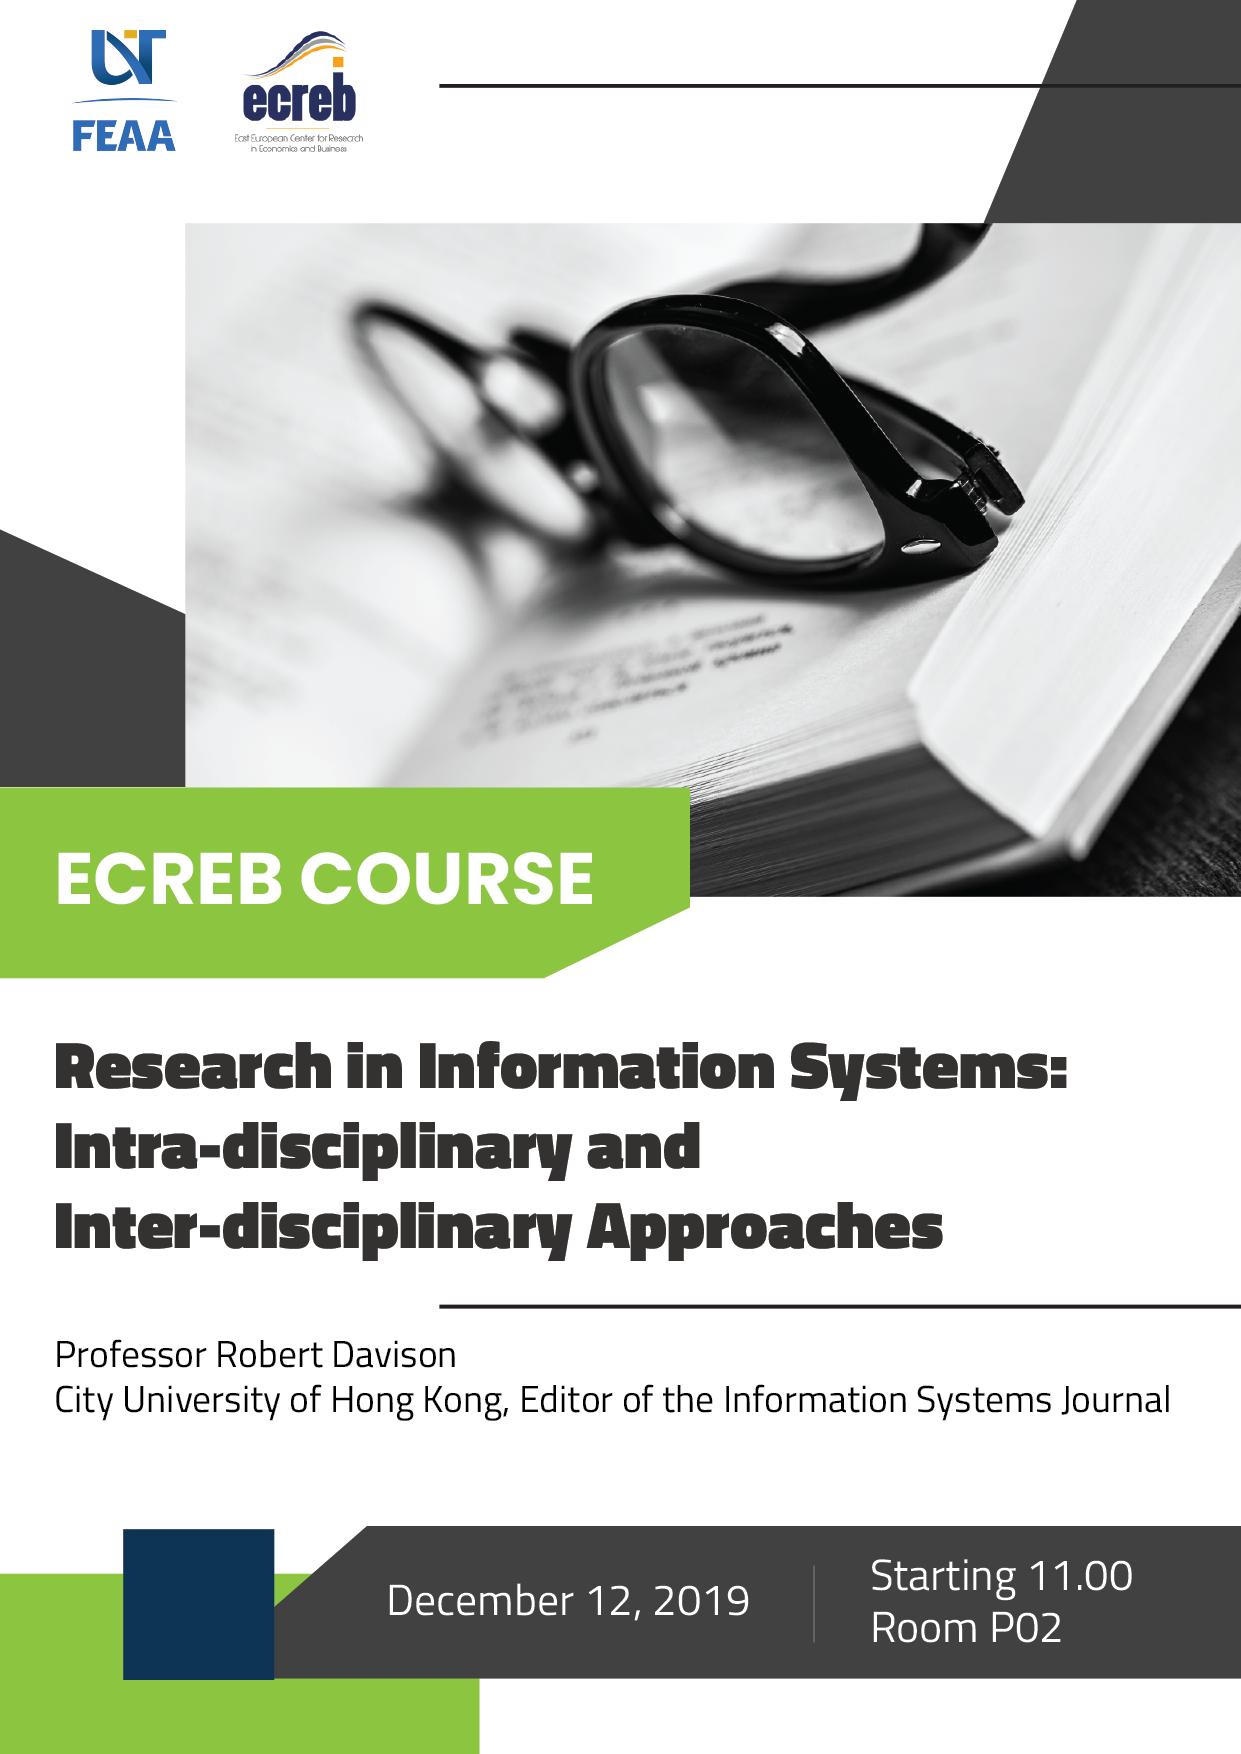 Ecreb Course Professor Robert Davison (1)